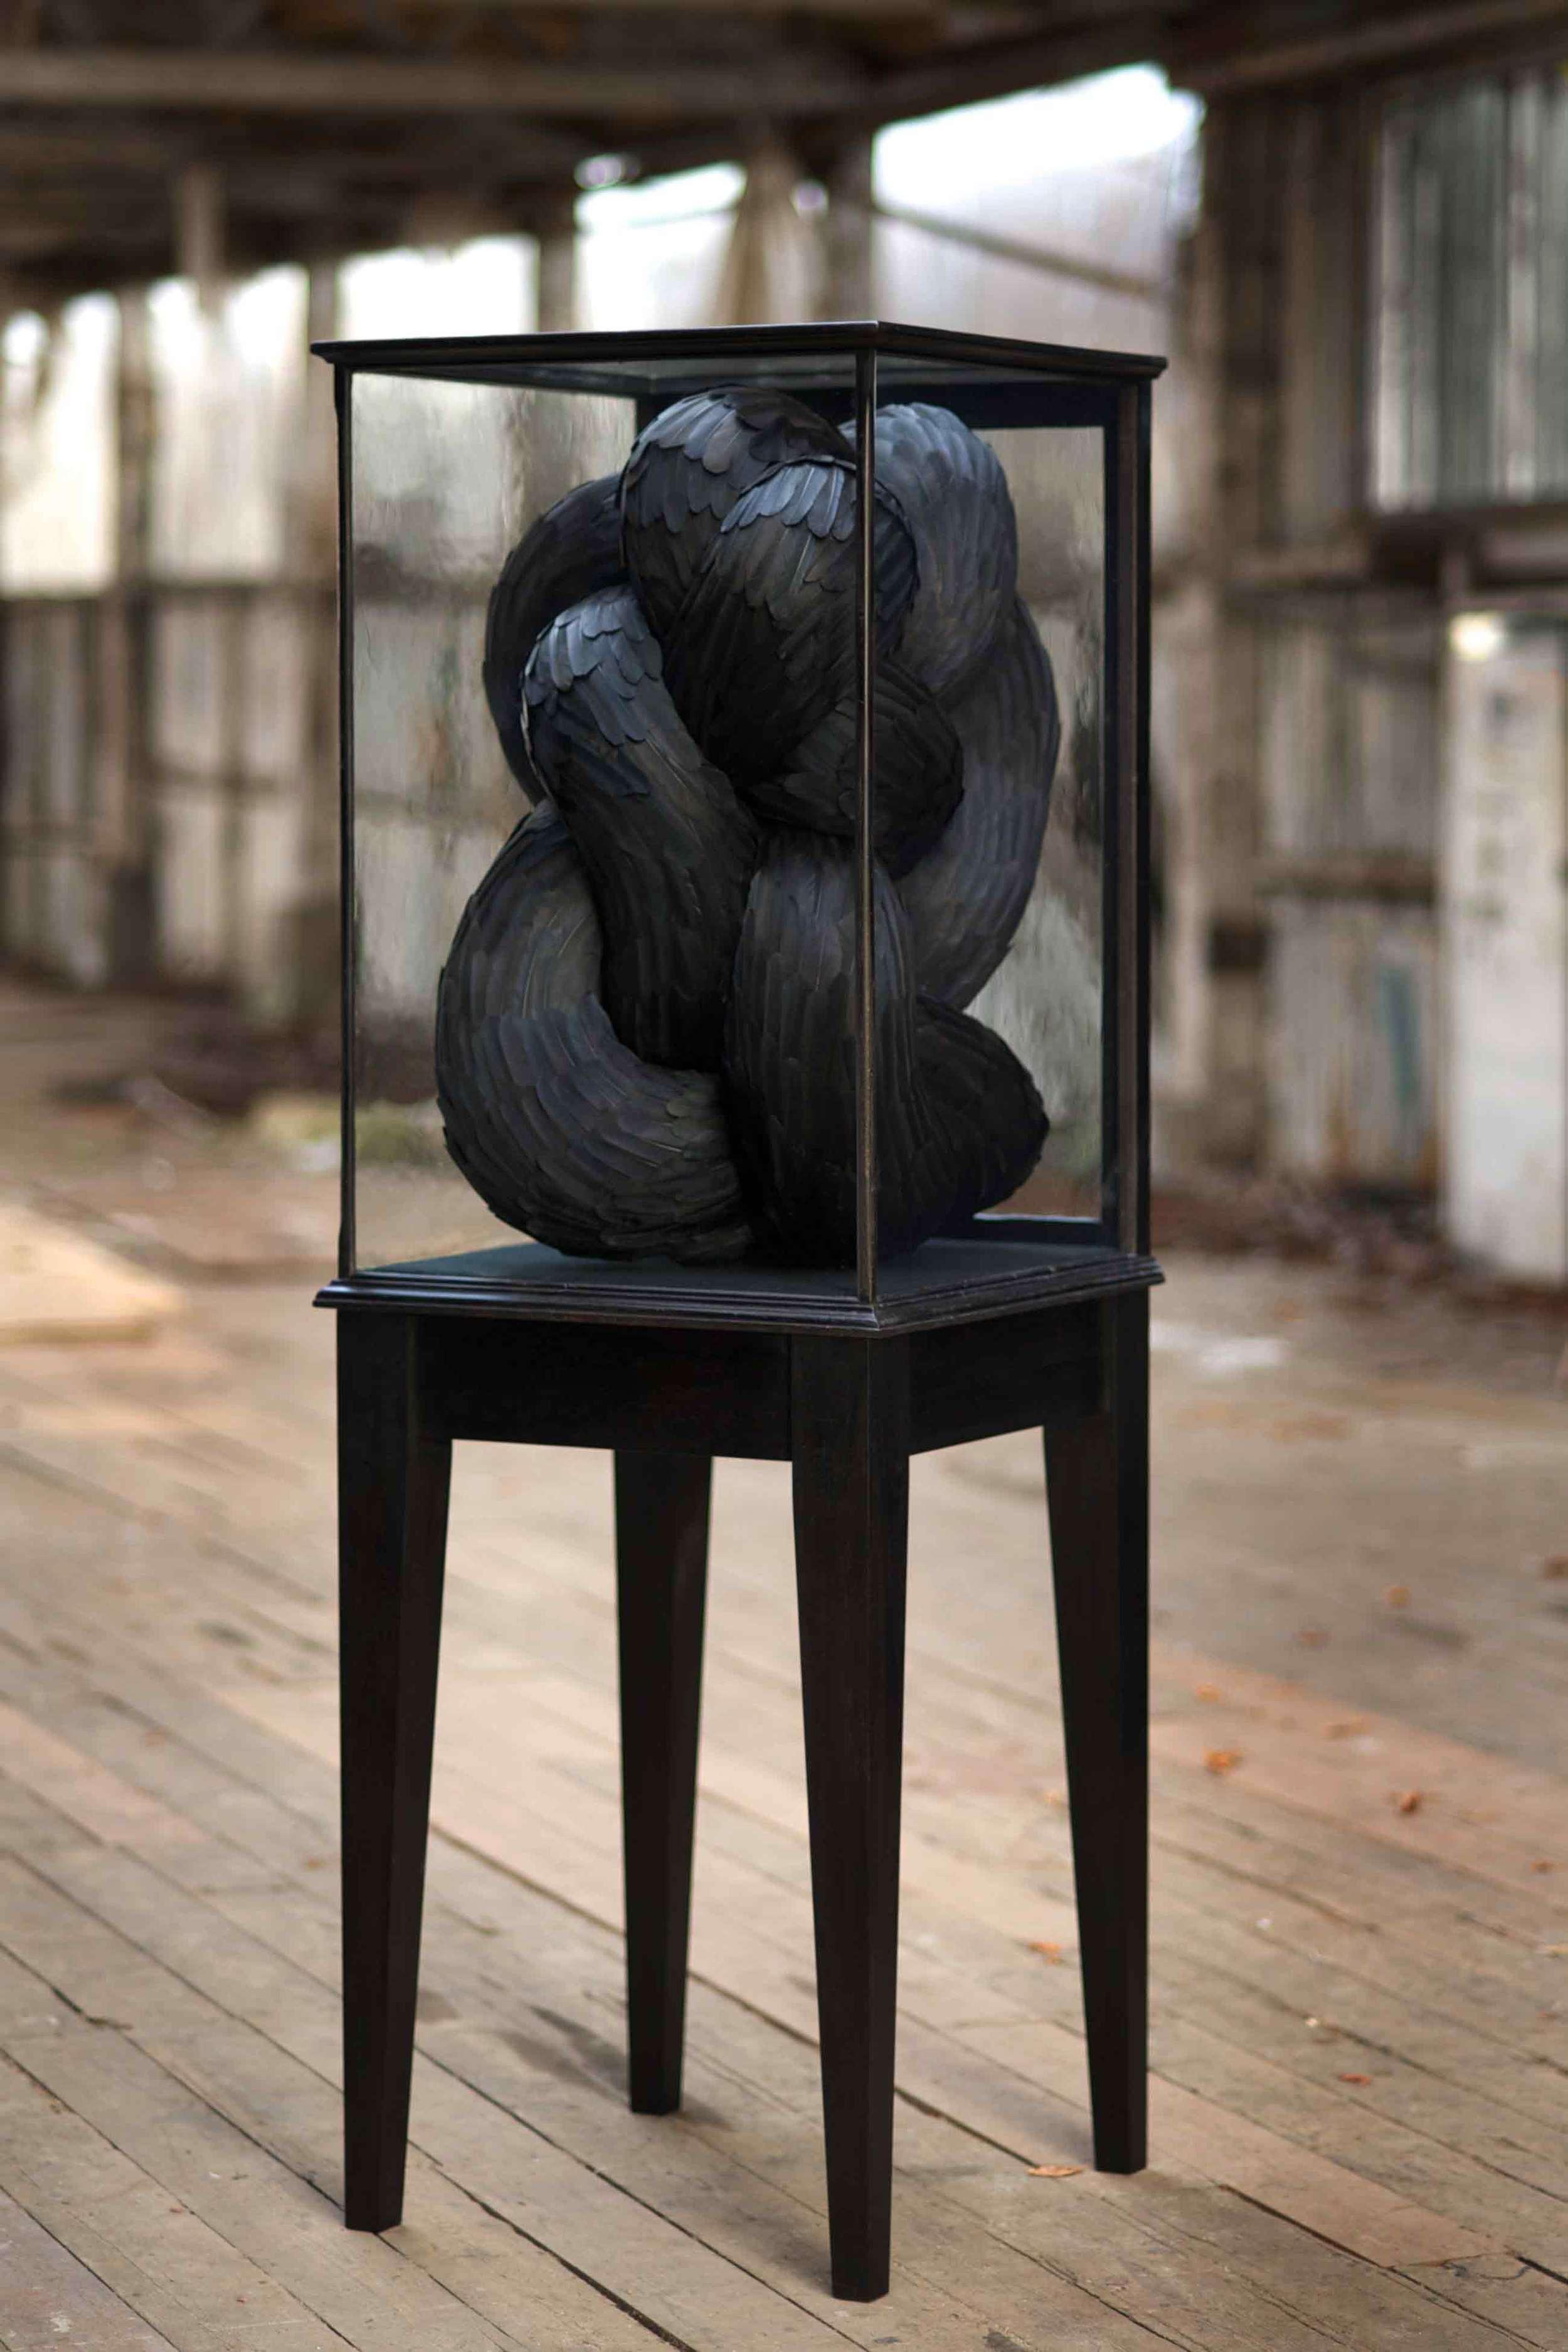 Flail, 2013, Kate MccGwire